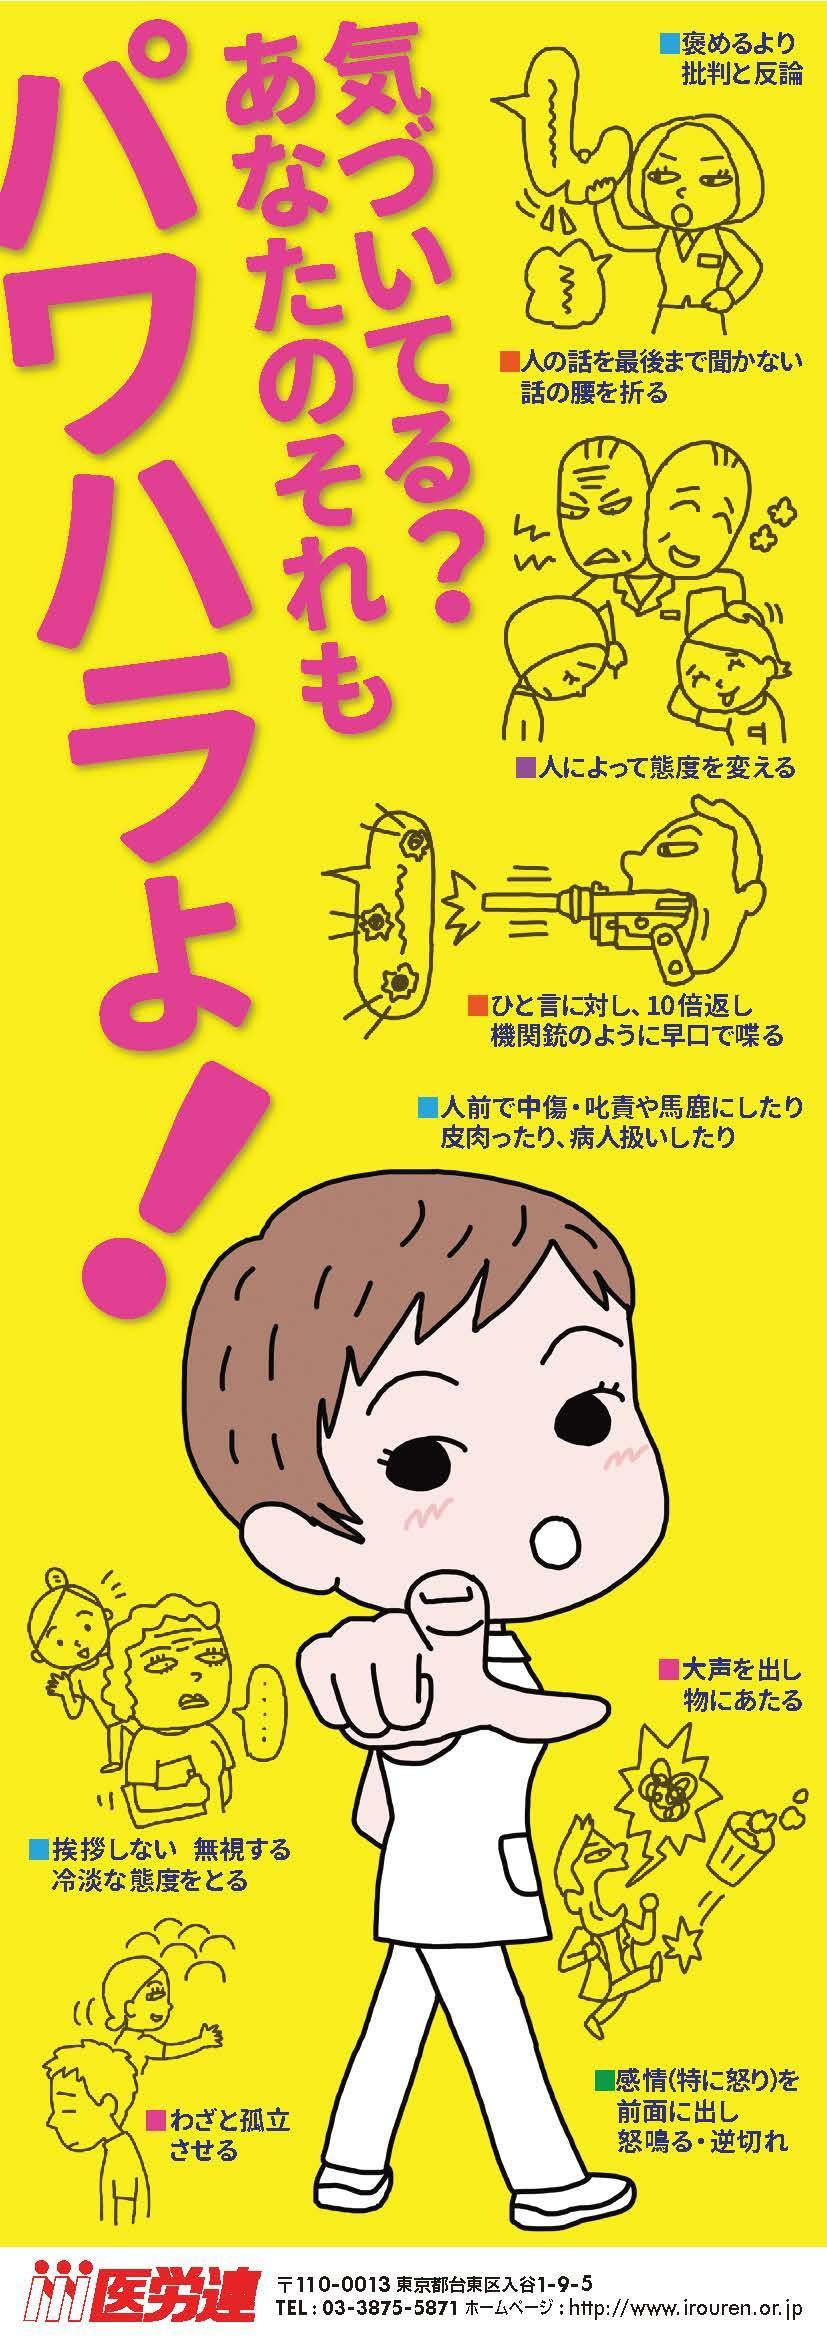 http://irouren.or.jp/news/49b61e2580c5f66a786bc4631ec811f2a7477aa6.jpg